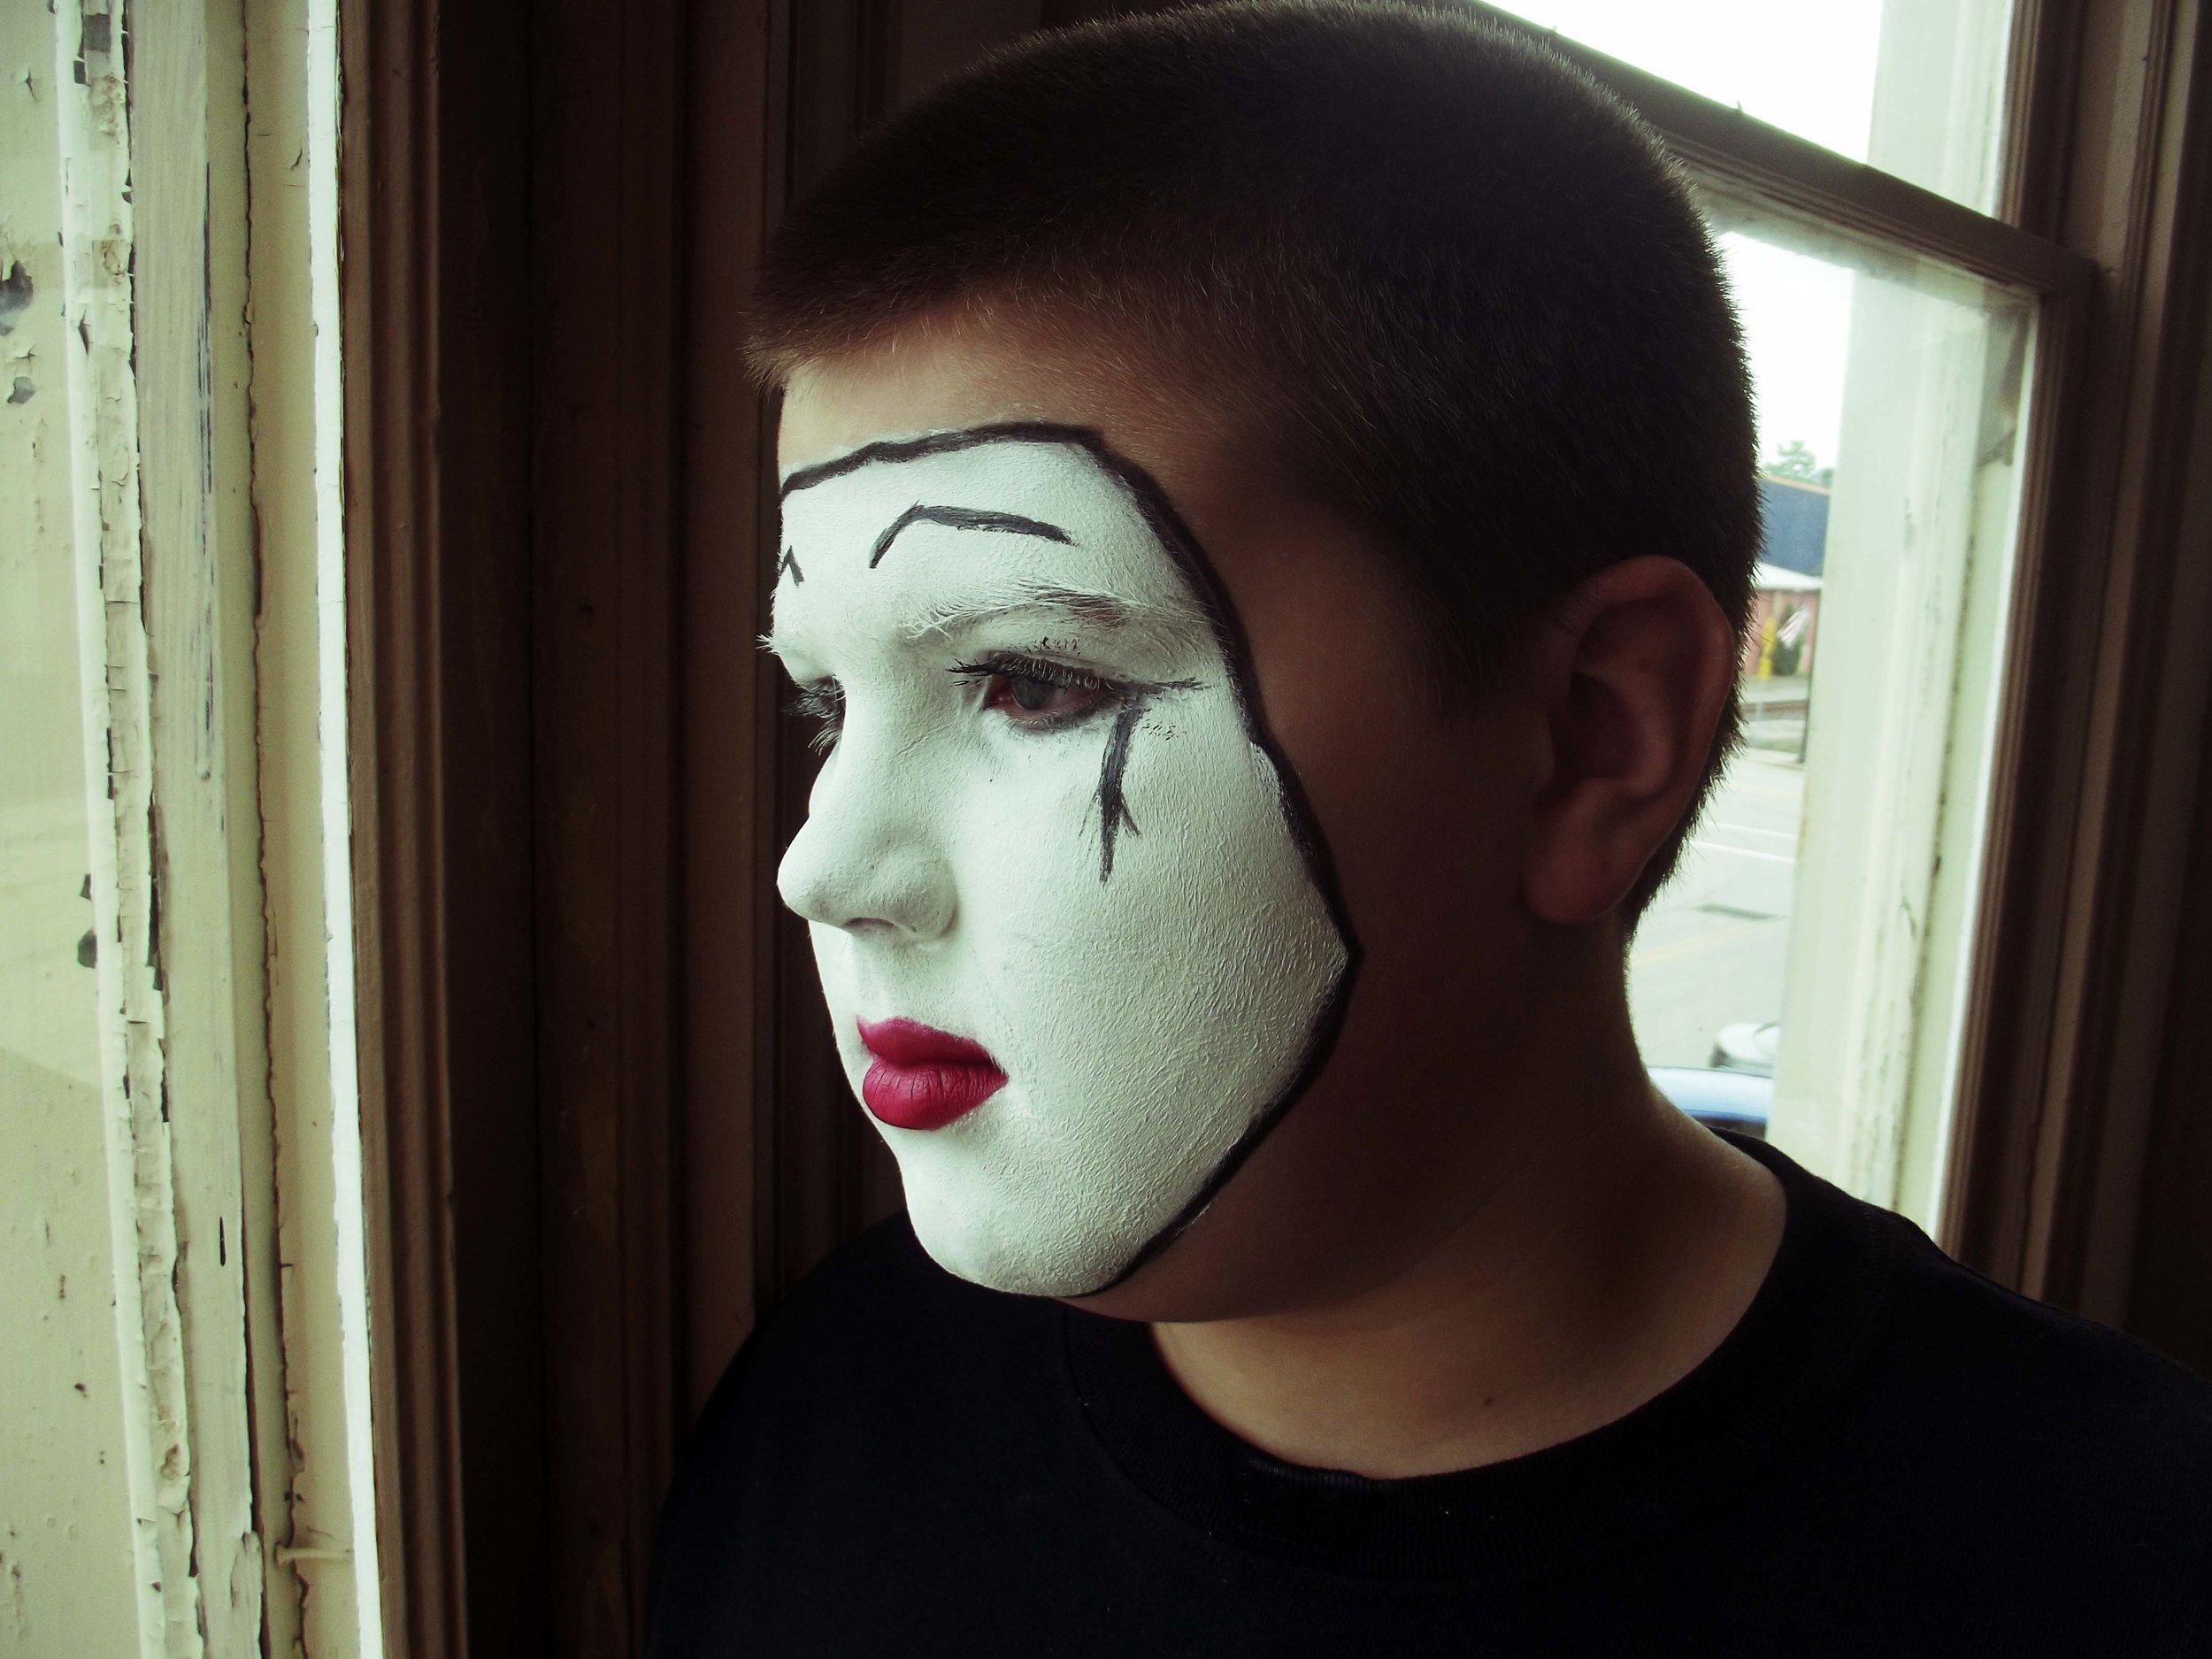 ronan mime looking out window_edited-1.jpg